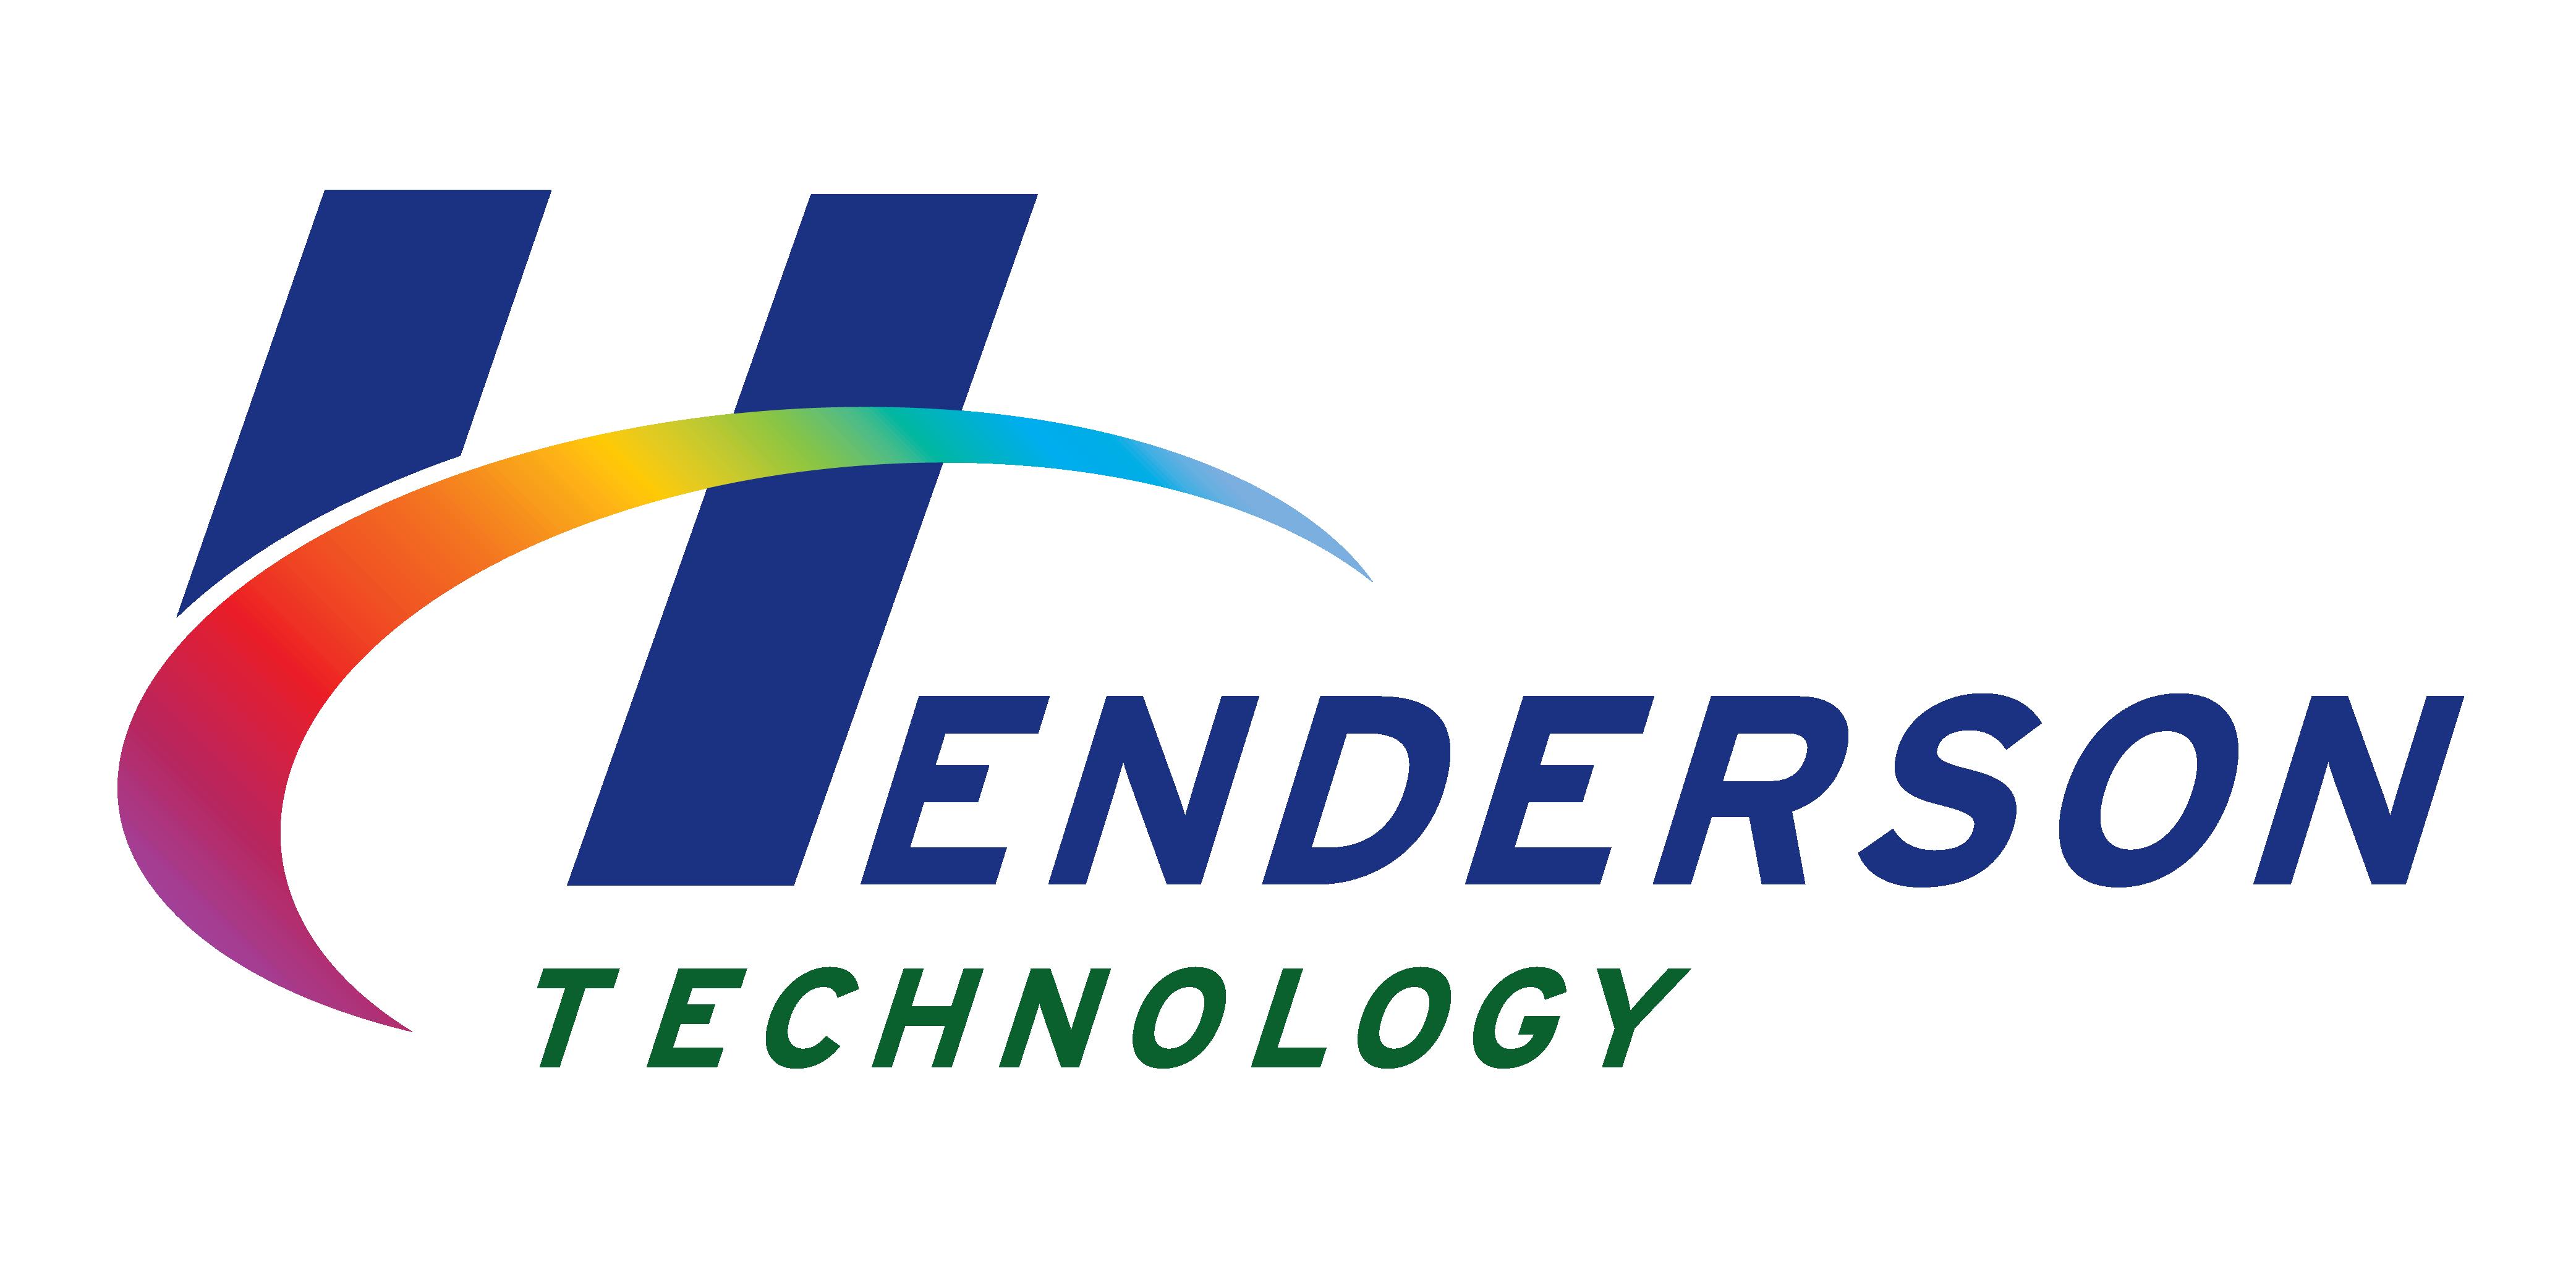 Henderson Technology